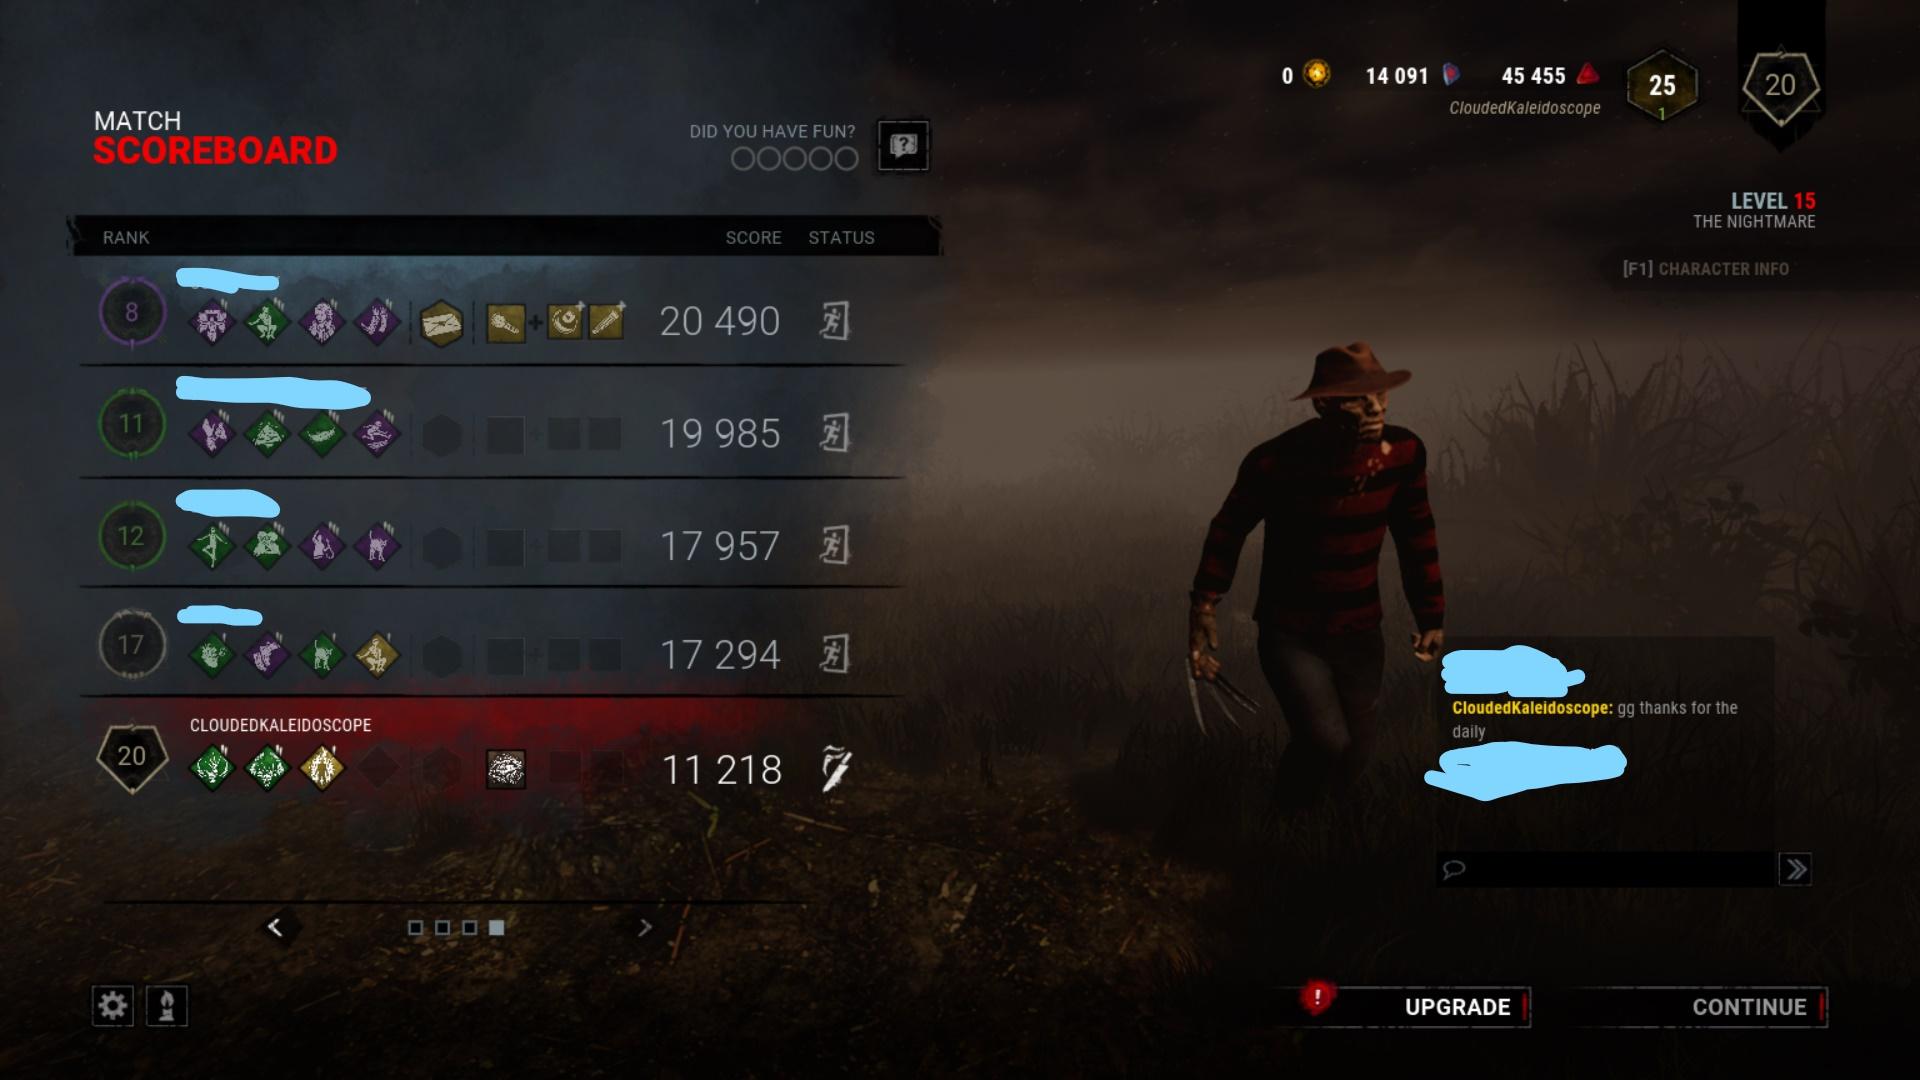 Matchmaking lobby